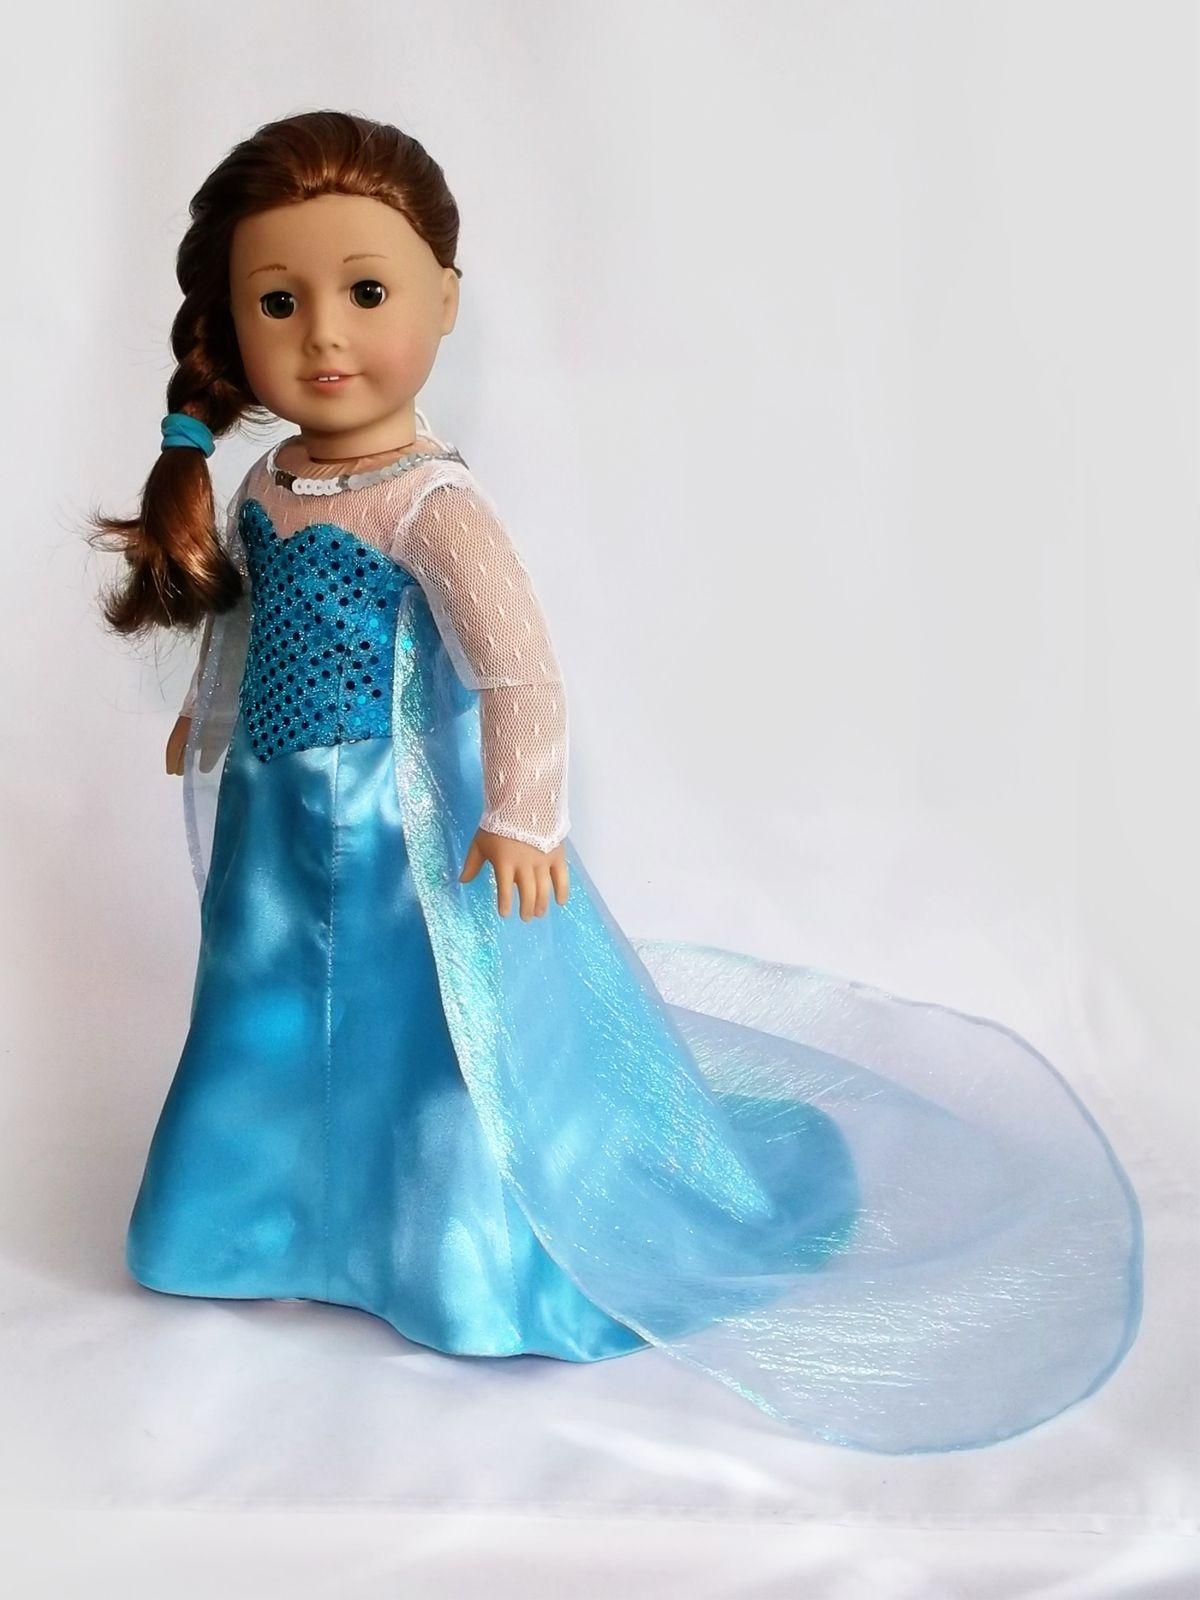 Disney Princess Snow Queen Elsa (Frozen) dress for American Girl Doll  sc 1 st  Pinterest & Disney Princess Snow Queen Elsa (Frozen) dress for American Girl ...